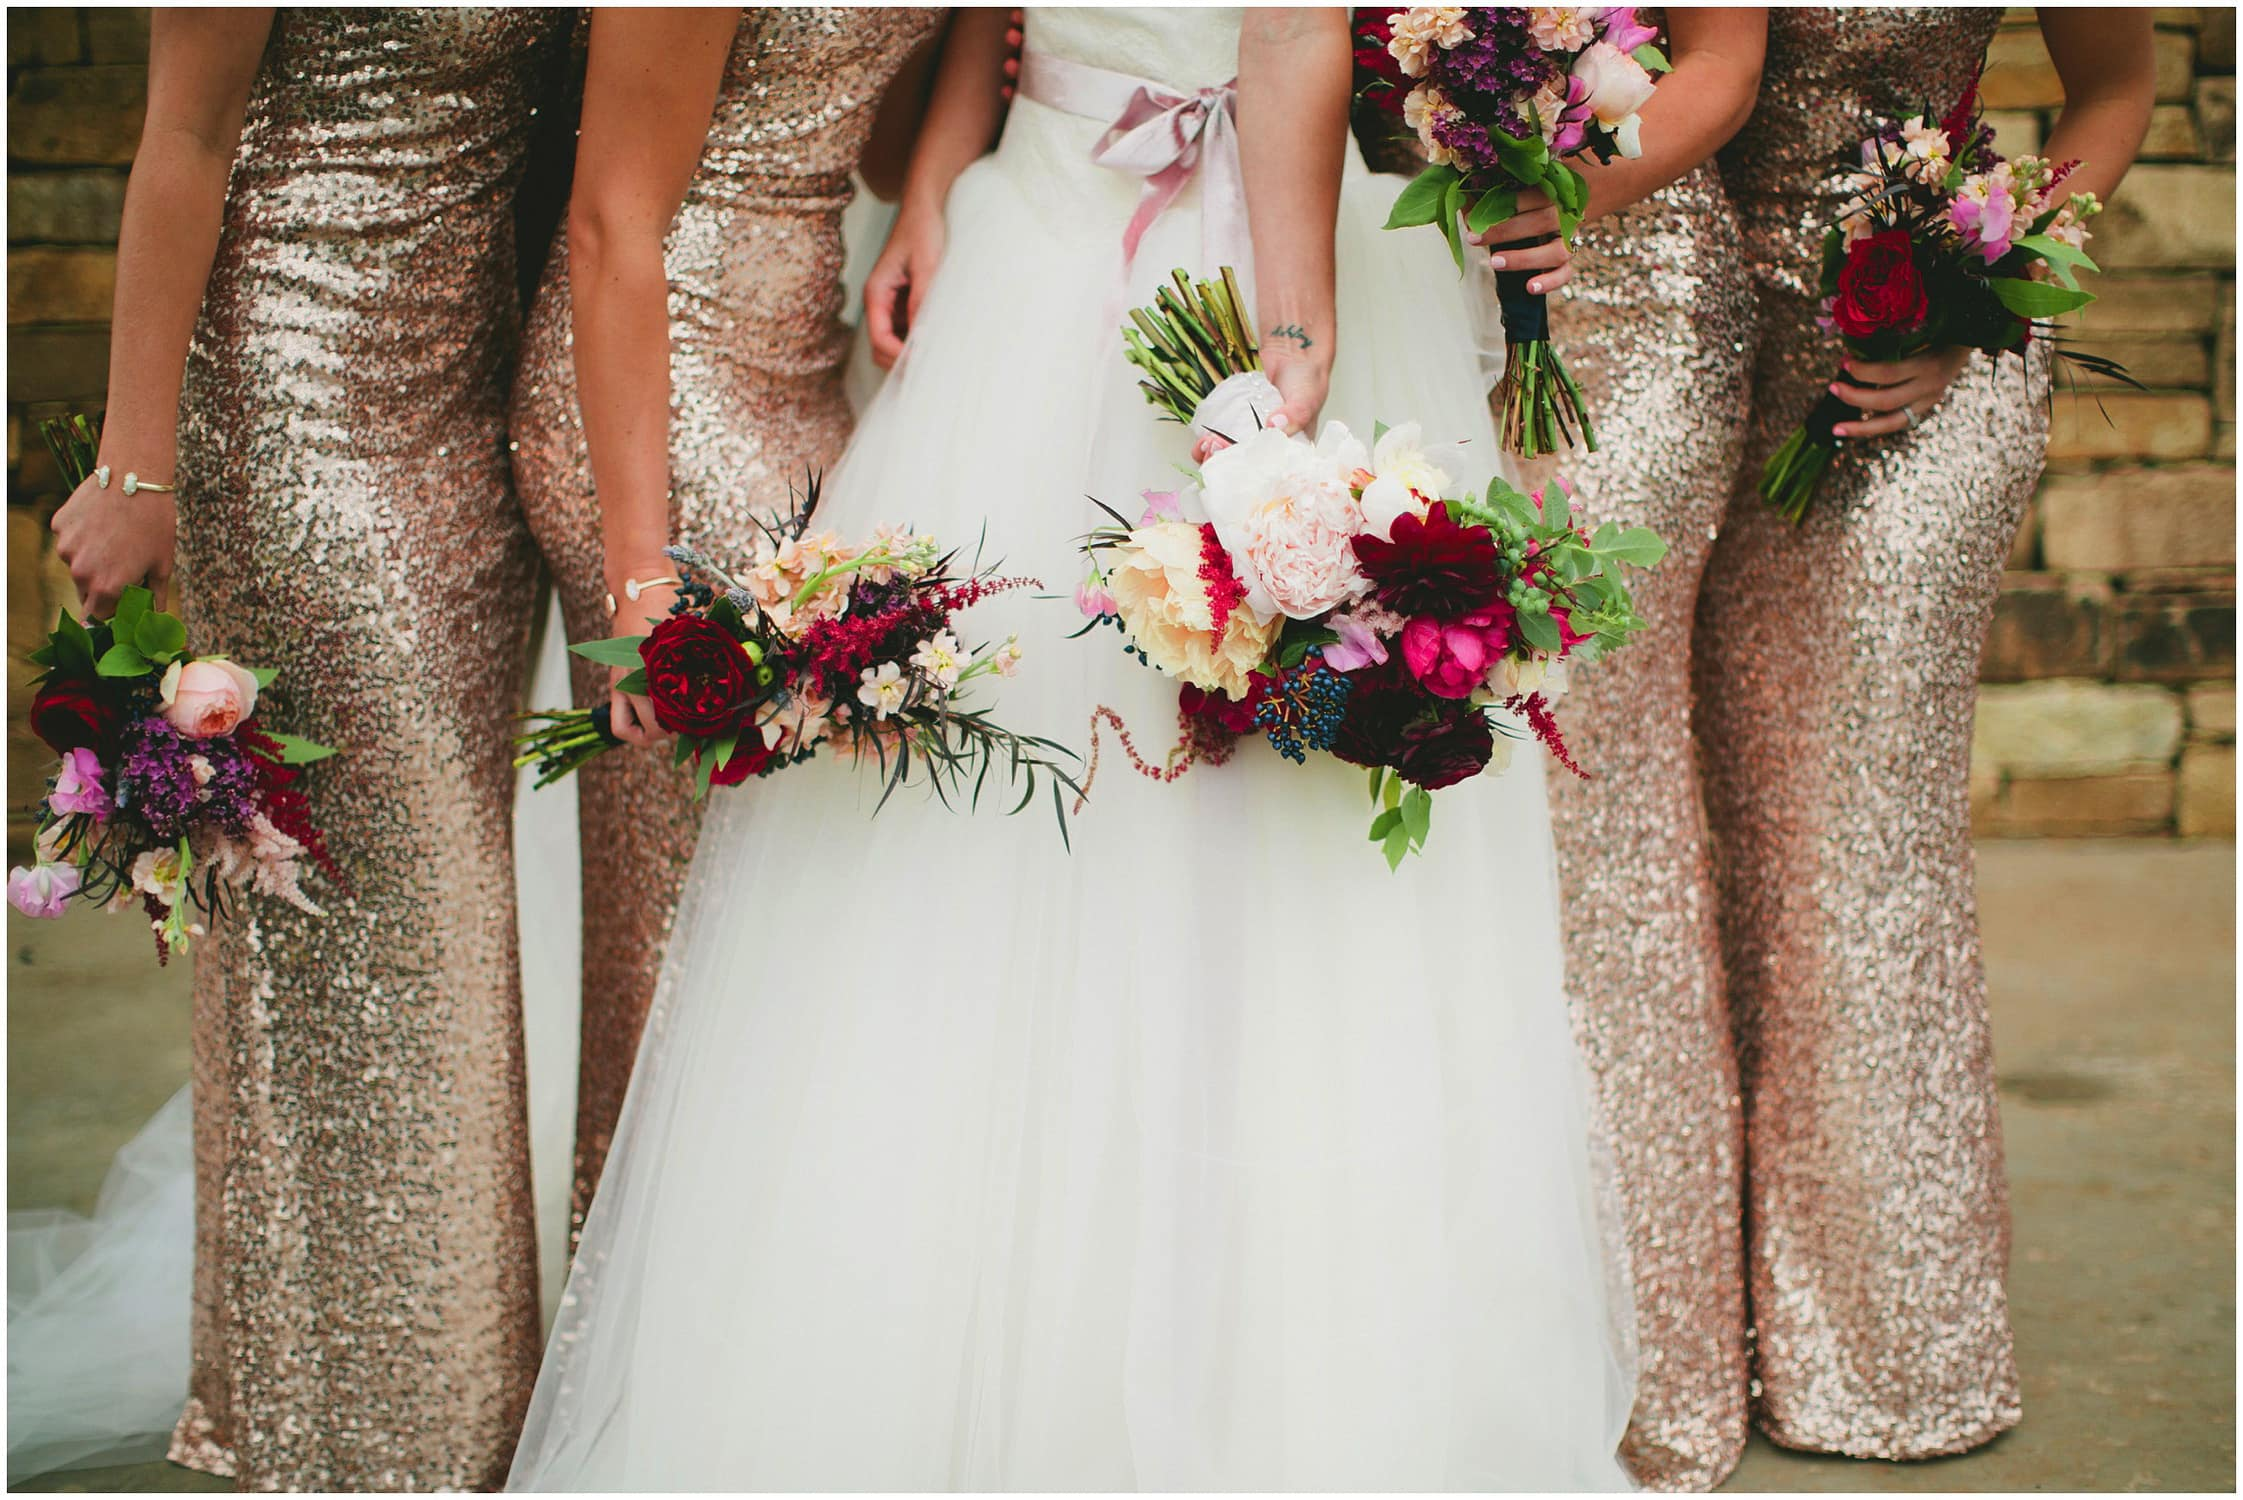 southwindhills_oklahoma_wedding0527_blogstomped